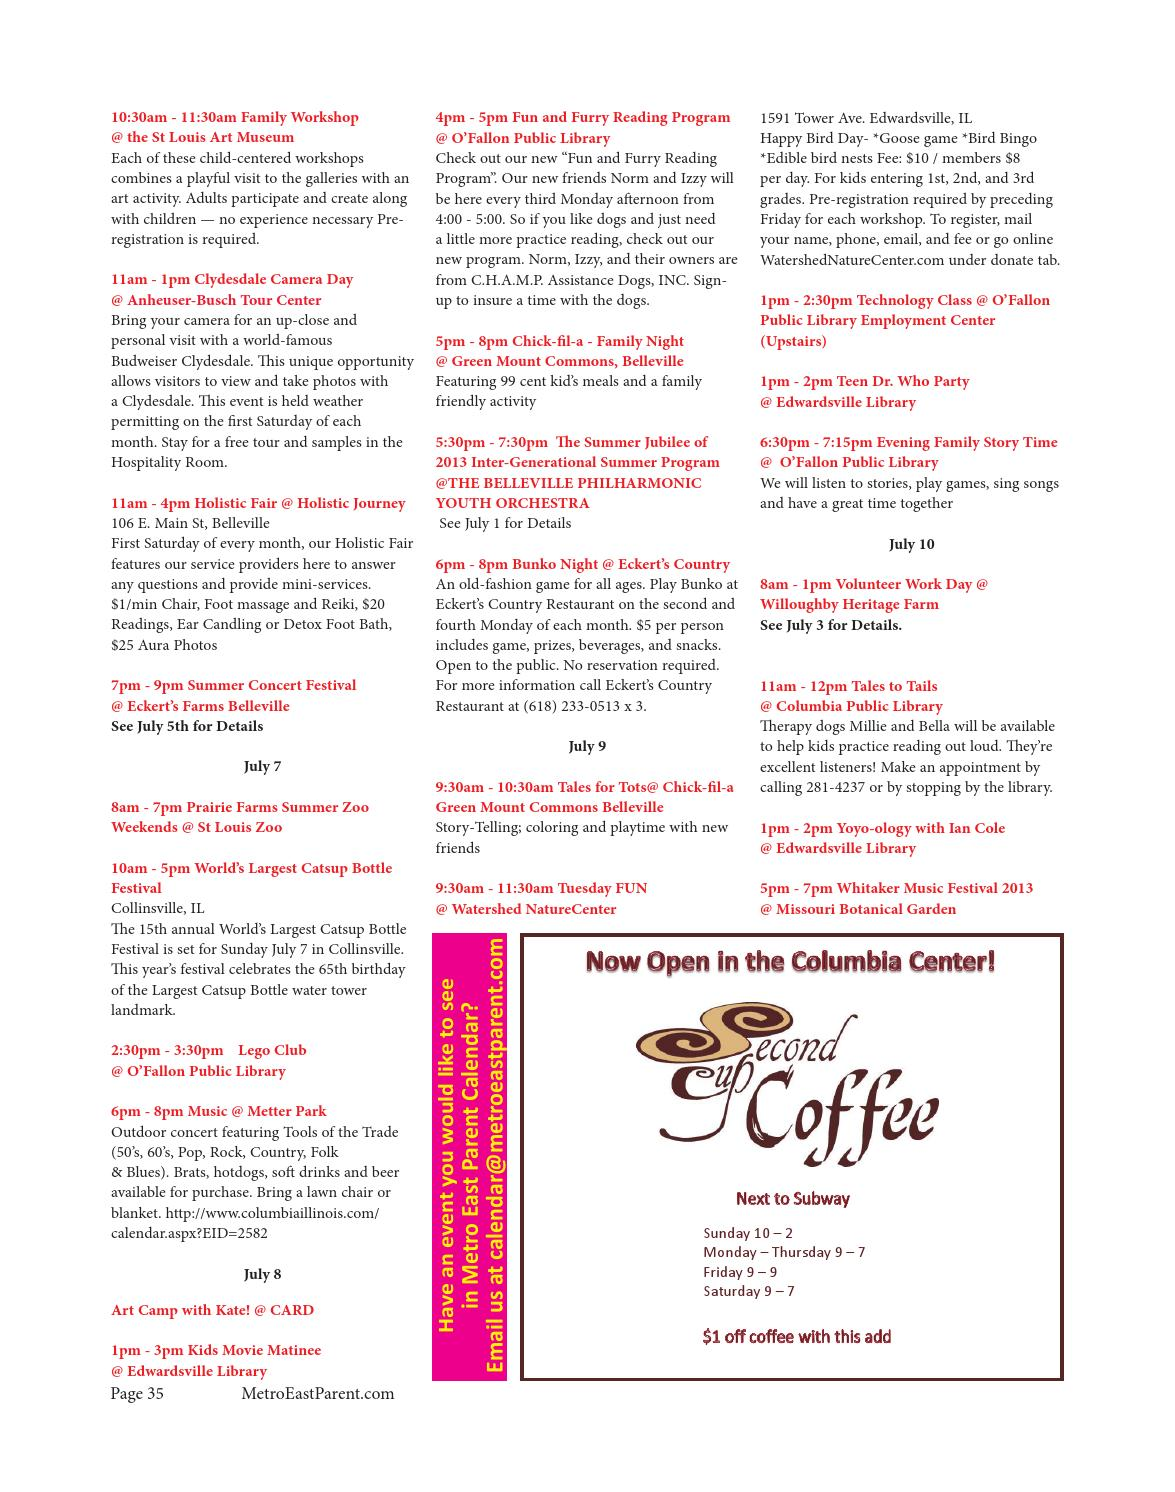 Metro East Parent Magazine July 2013 by Robert Ludwig - issuu